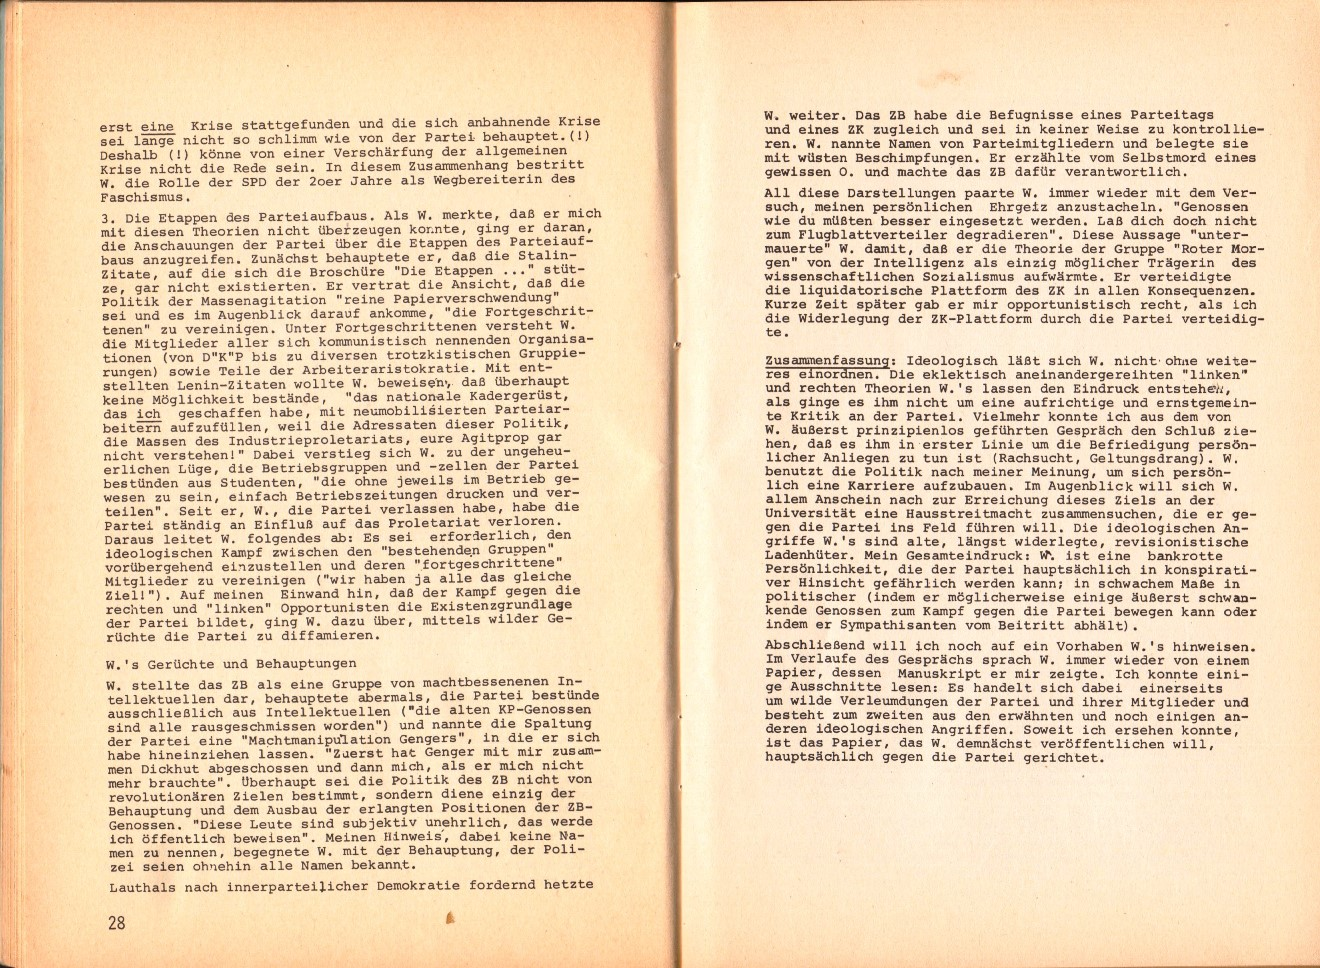 ZB_Parteiarbeiter_1971_10_16